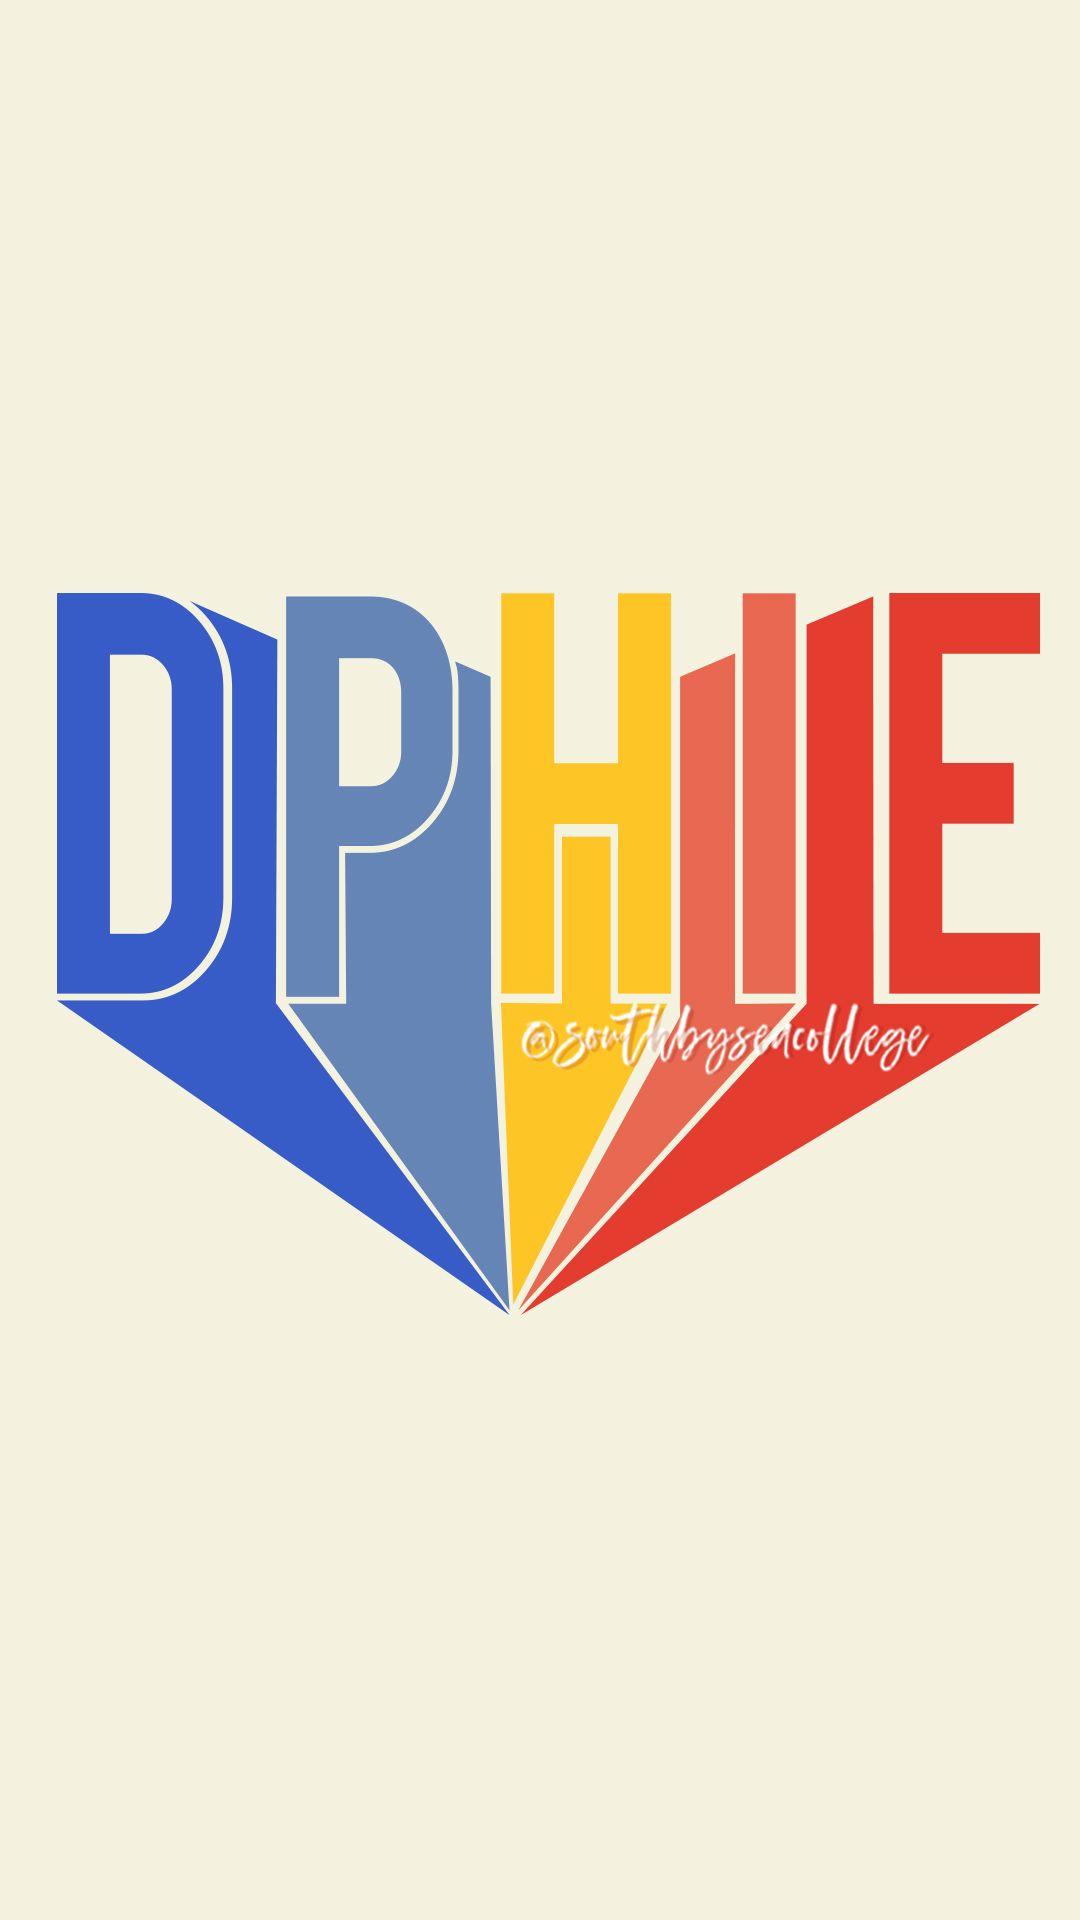 SOUTH BY SEA | @southbyseacollege ✰ Delta Phi Epsilon | DPhiE | Block Letters |